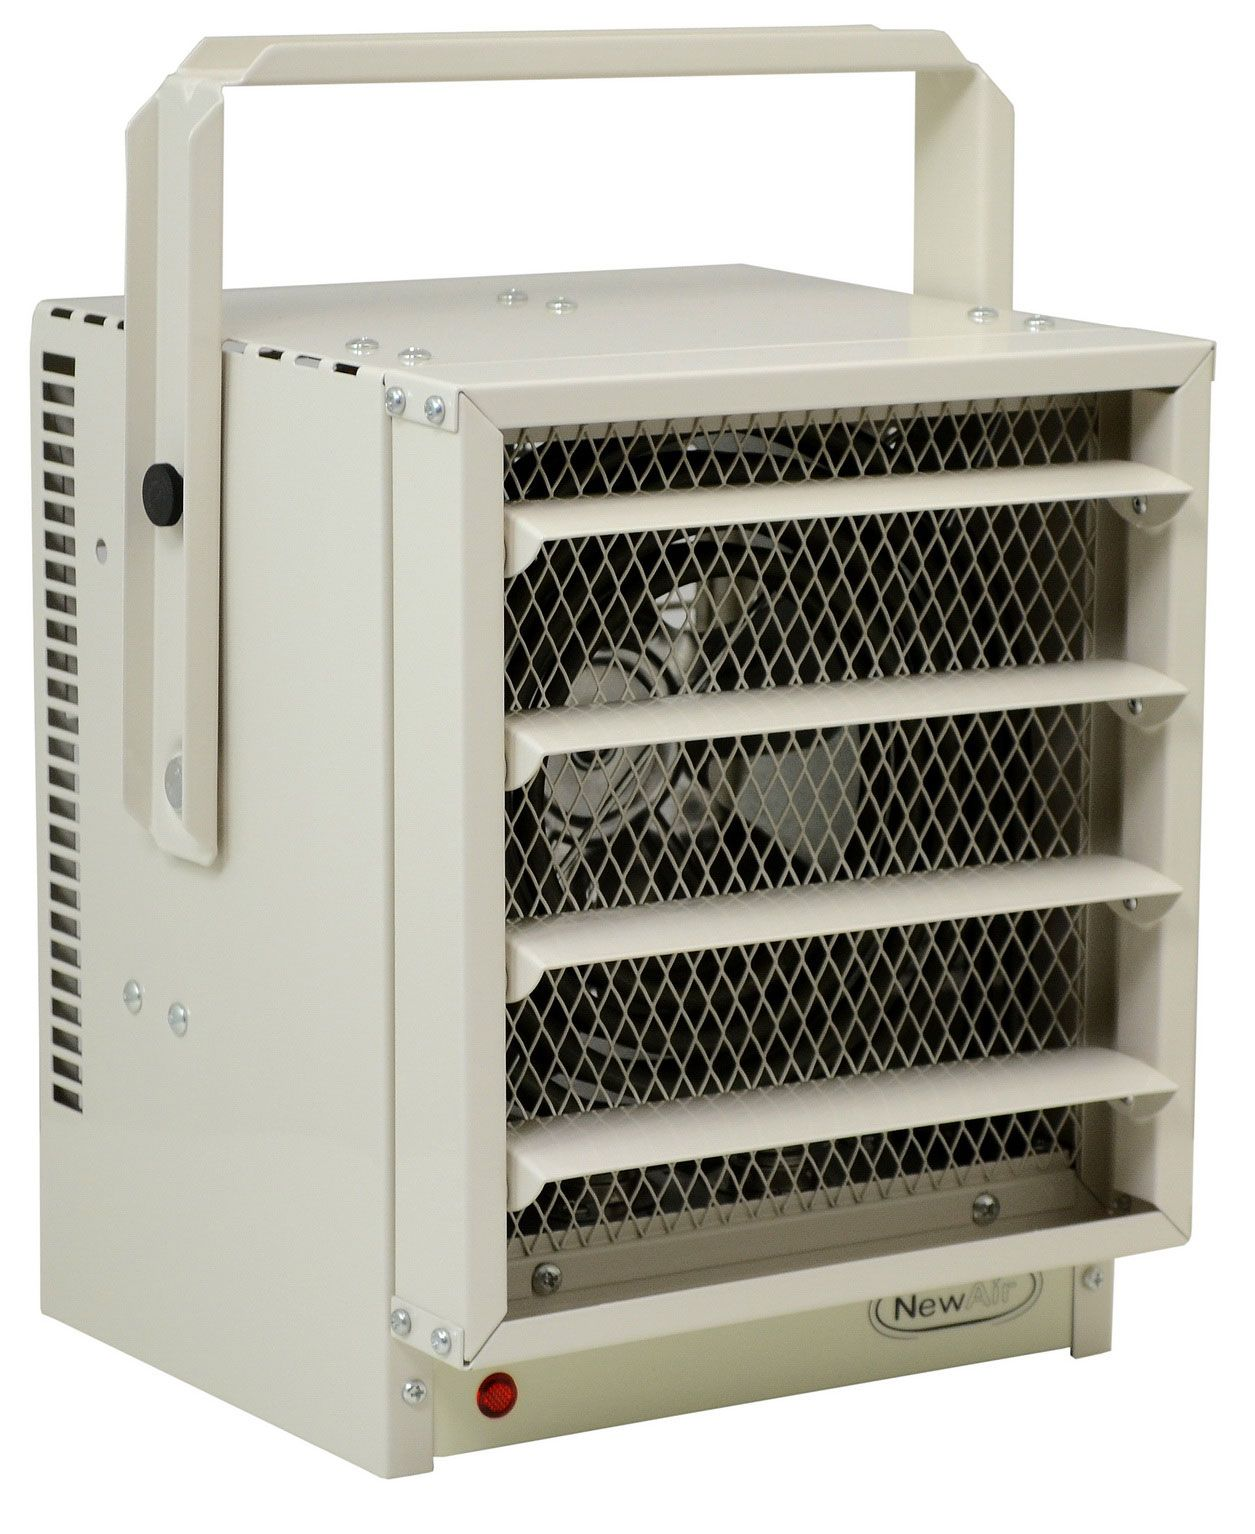 Powerful Propane Heater for Garage - http://ramseal.com ...